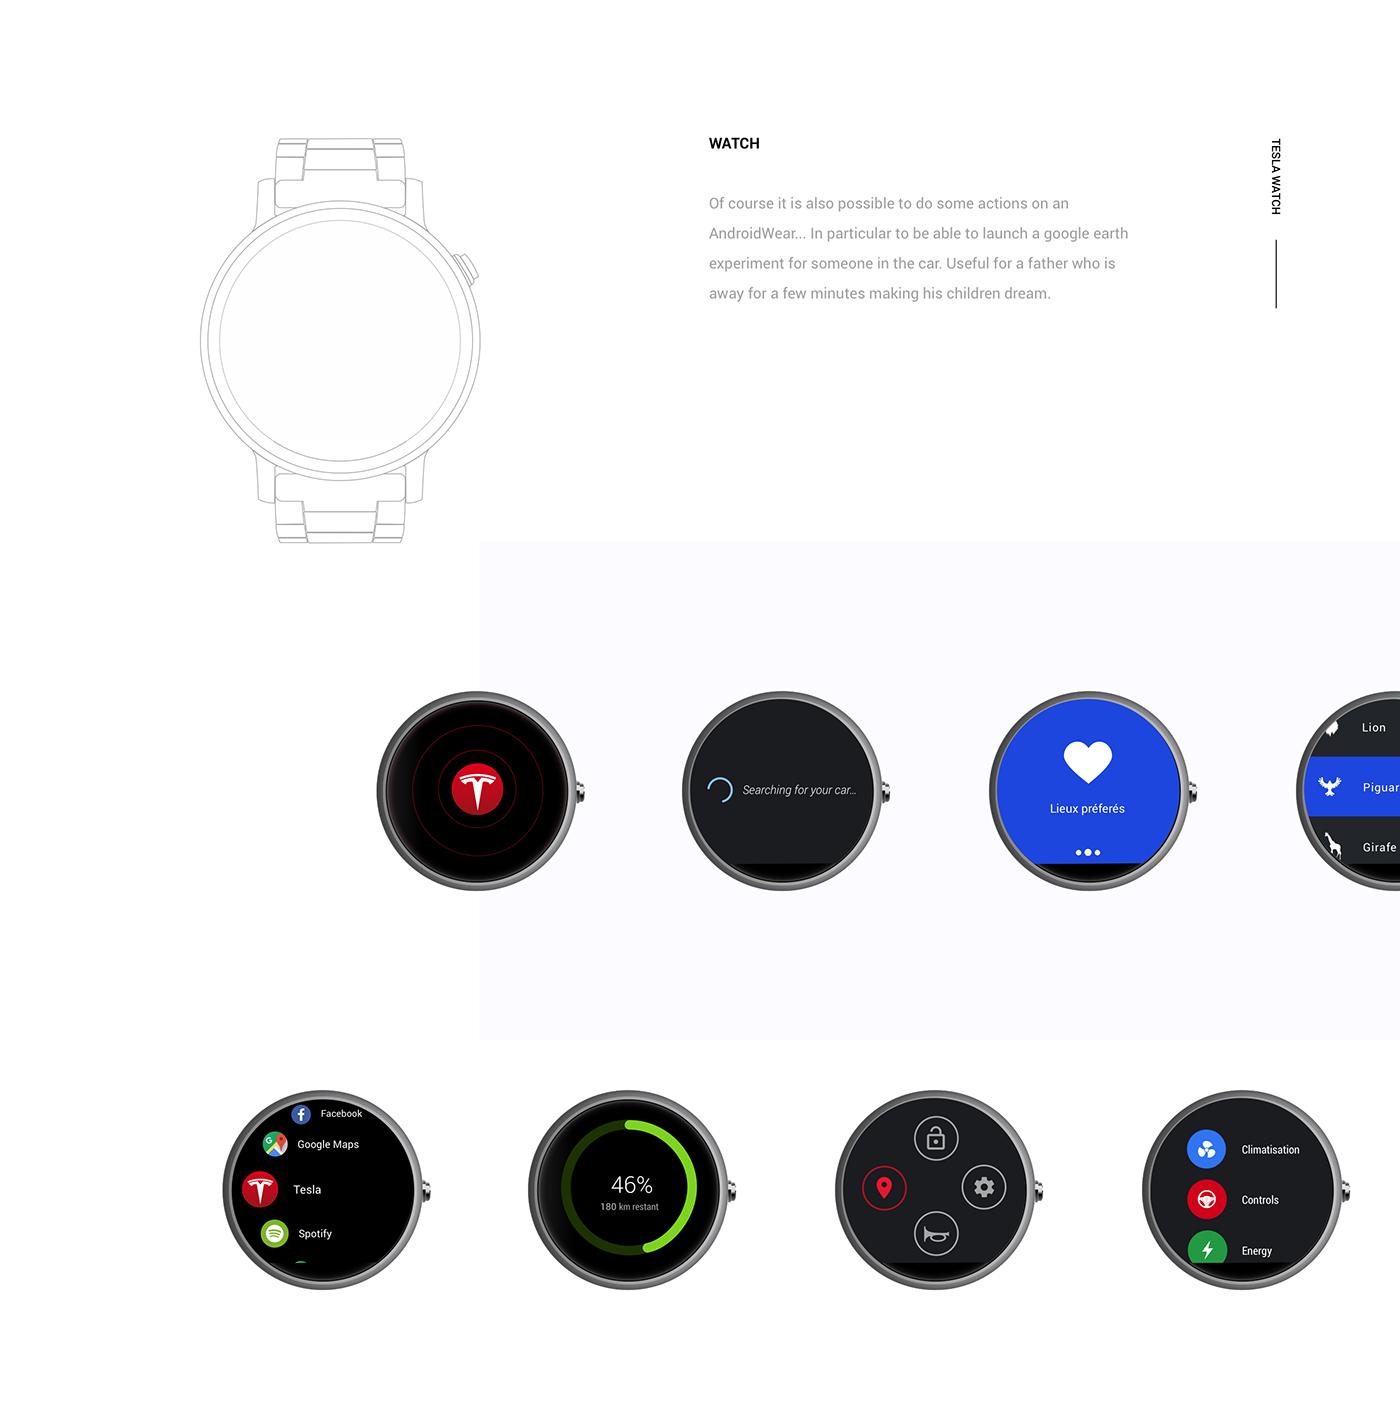 google tesla dashboard mobile watch car Interface ux UI Elon Musk